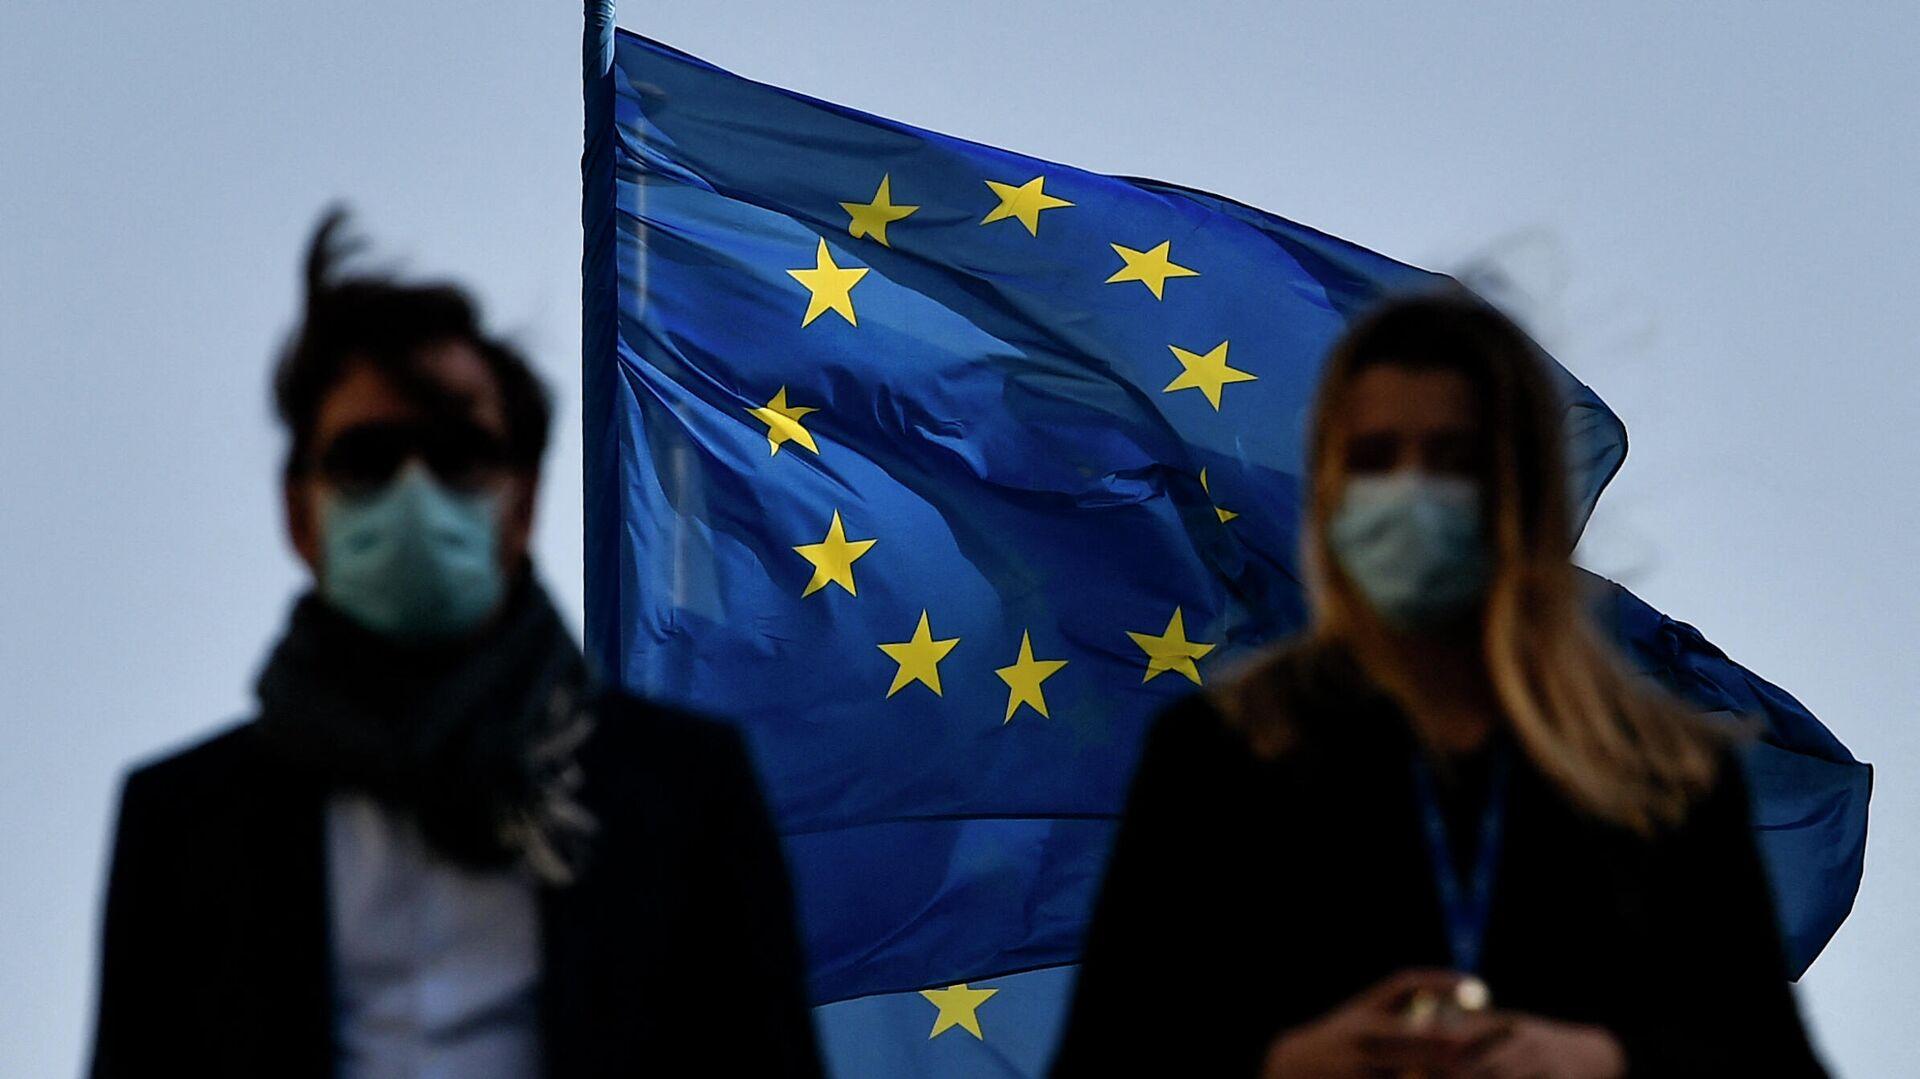 Флаг ЕС в Брюсселе - РИА Новости, 1920, 23.04.2021